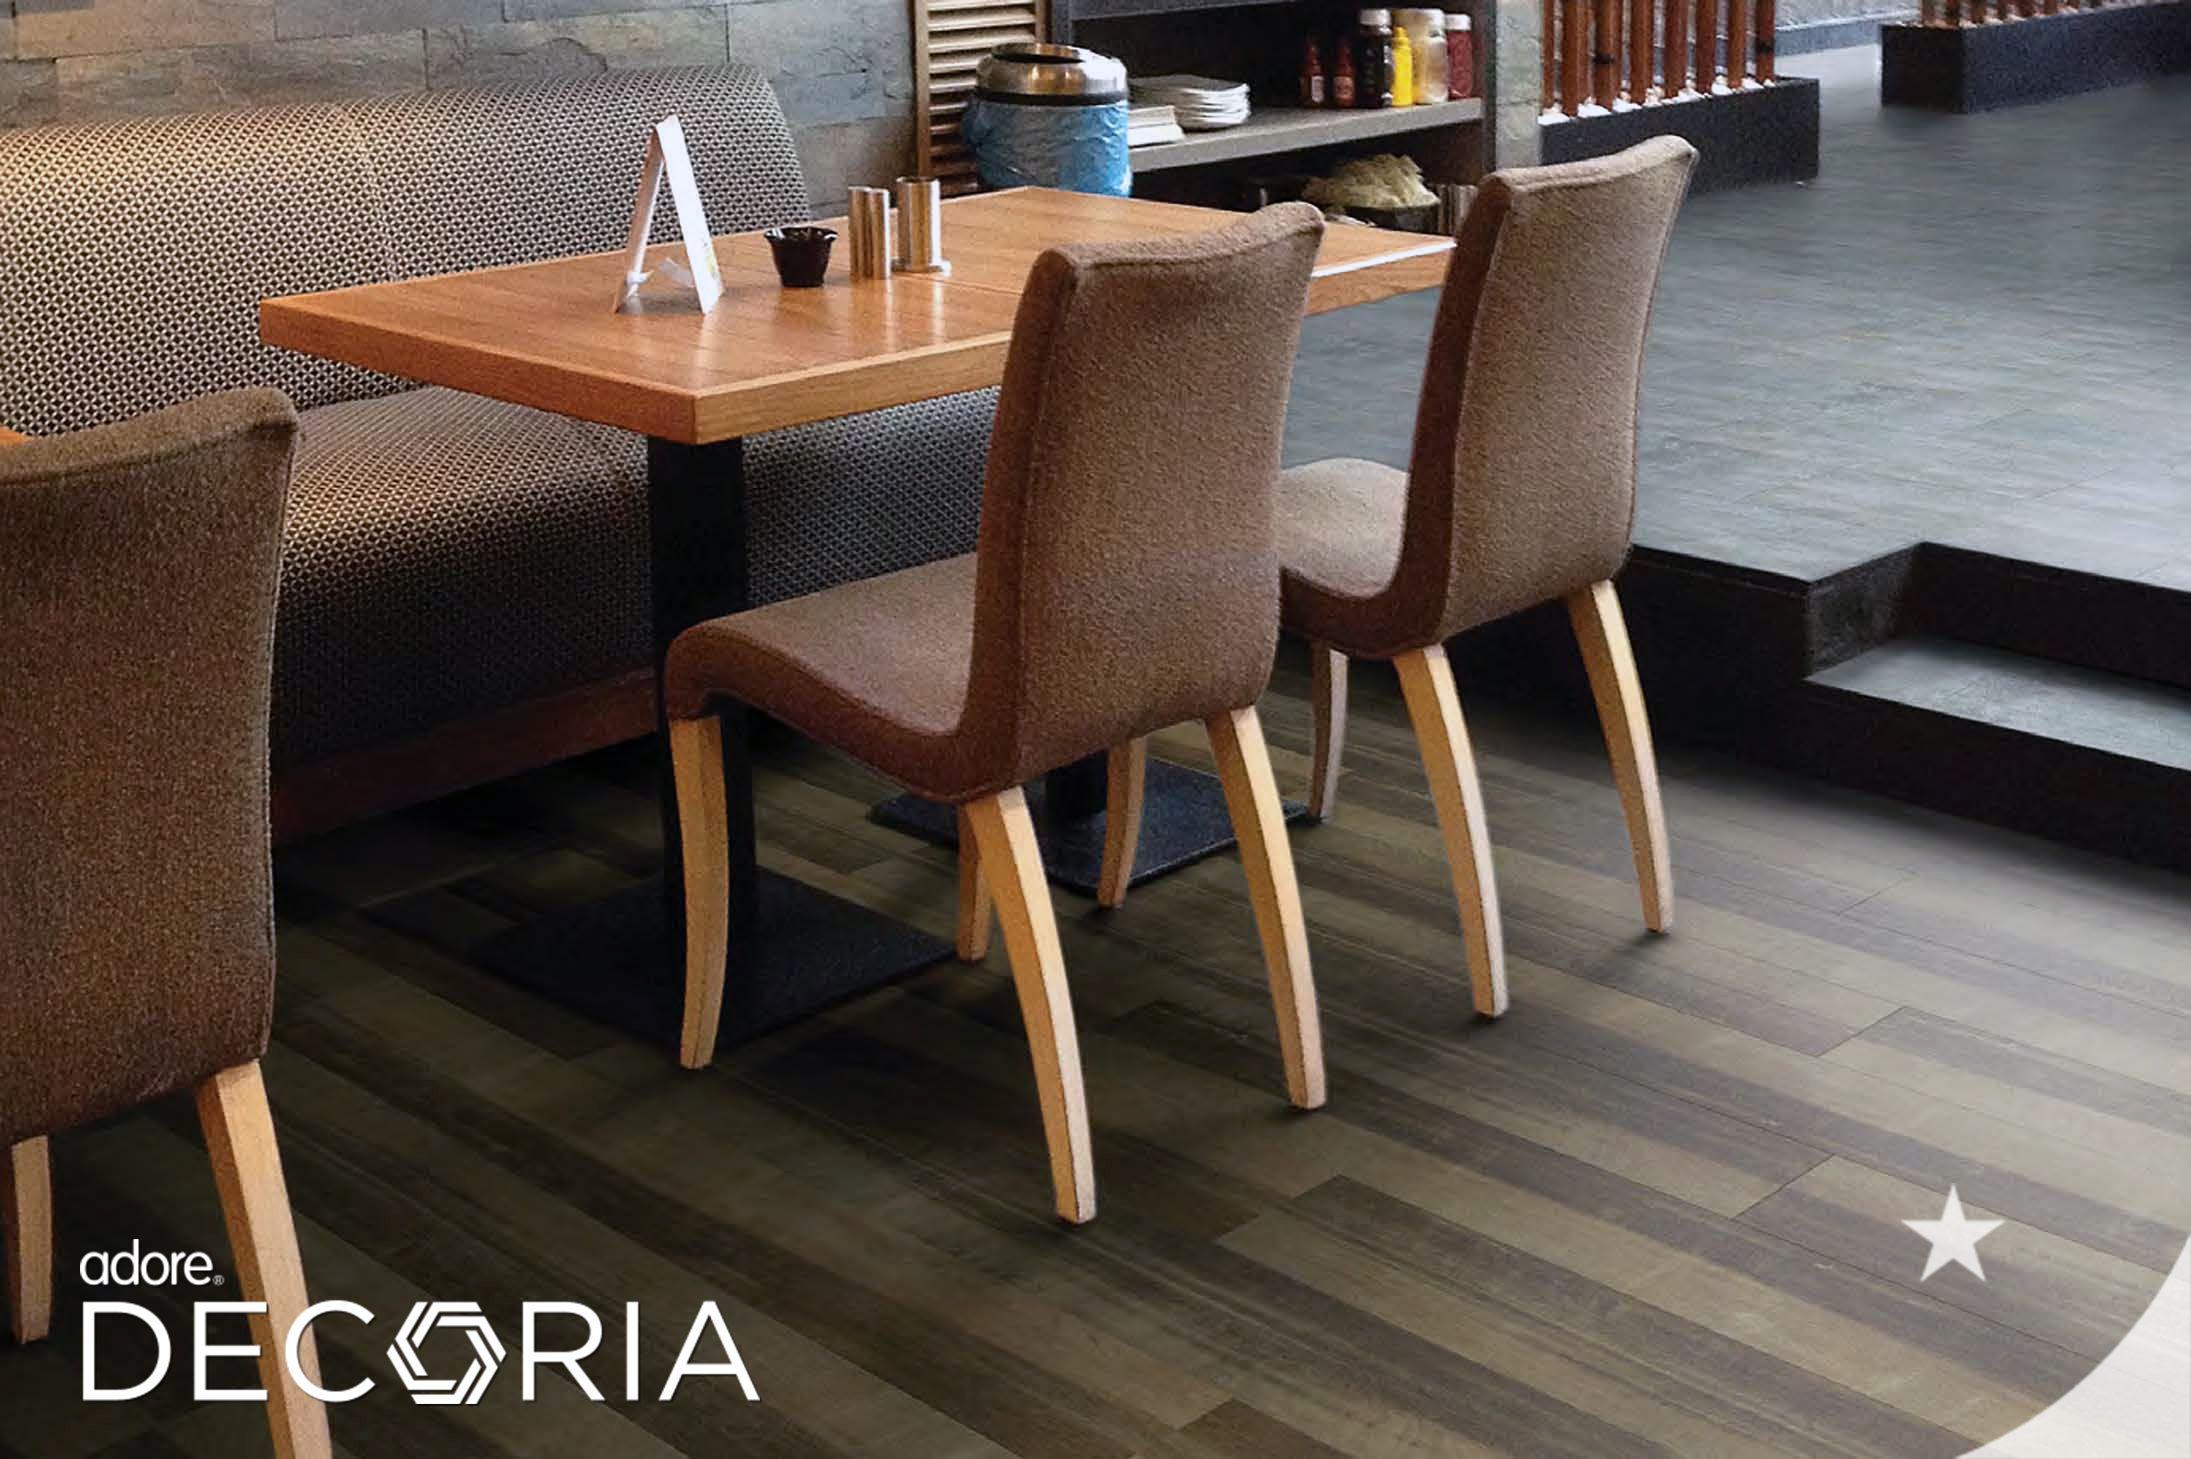 Adore Decoria Luxury Vinyl Flooring On Sale Save 30 60 Diy Doityourself Home Design Vinyl House Luxury Vinyl Flooring Vinyl Flooring Flooring